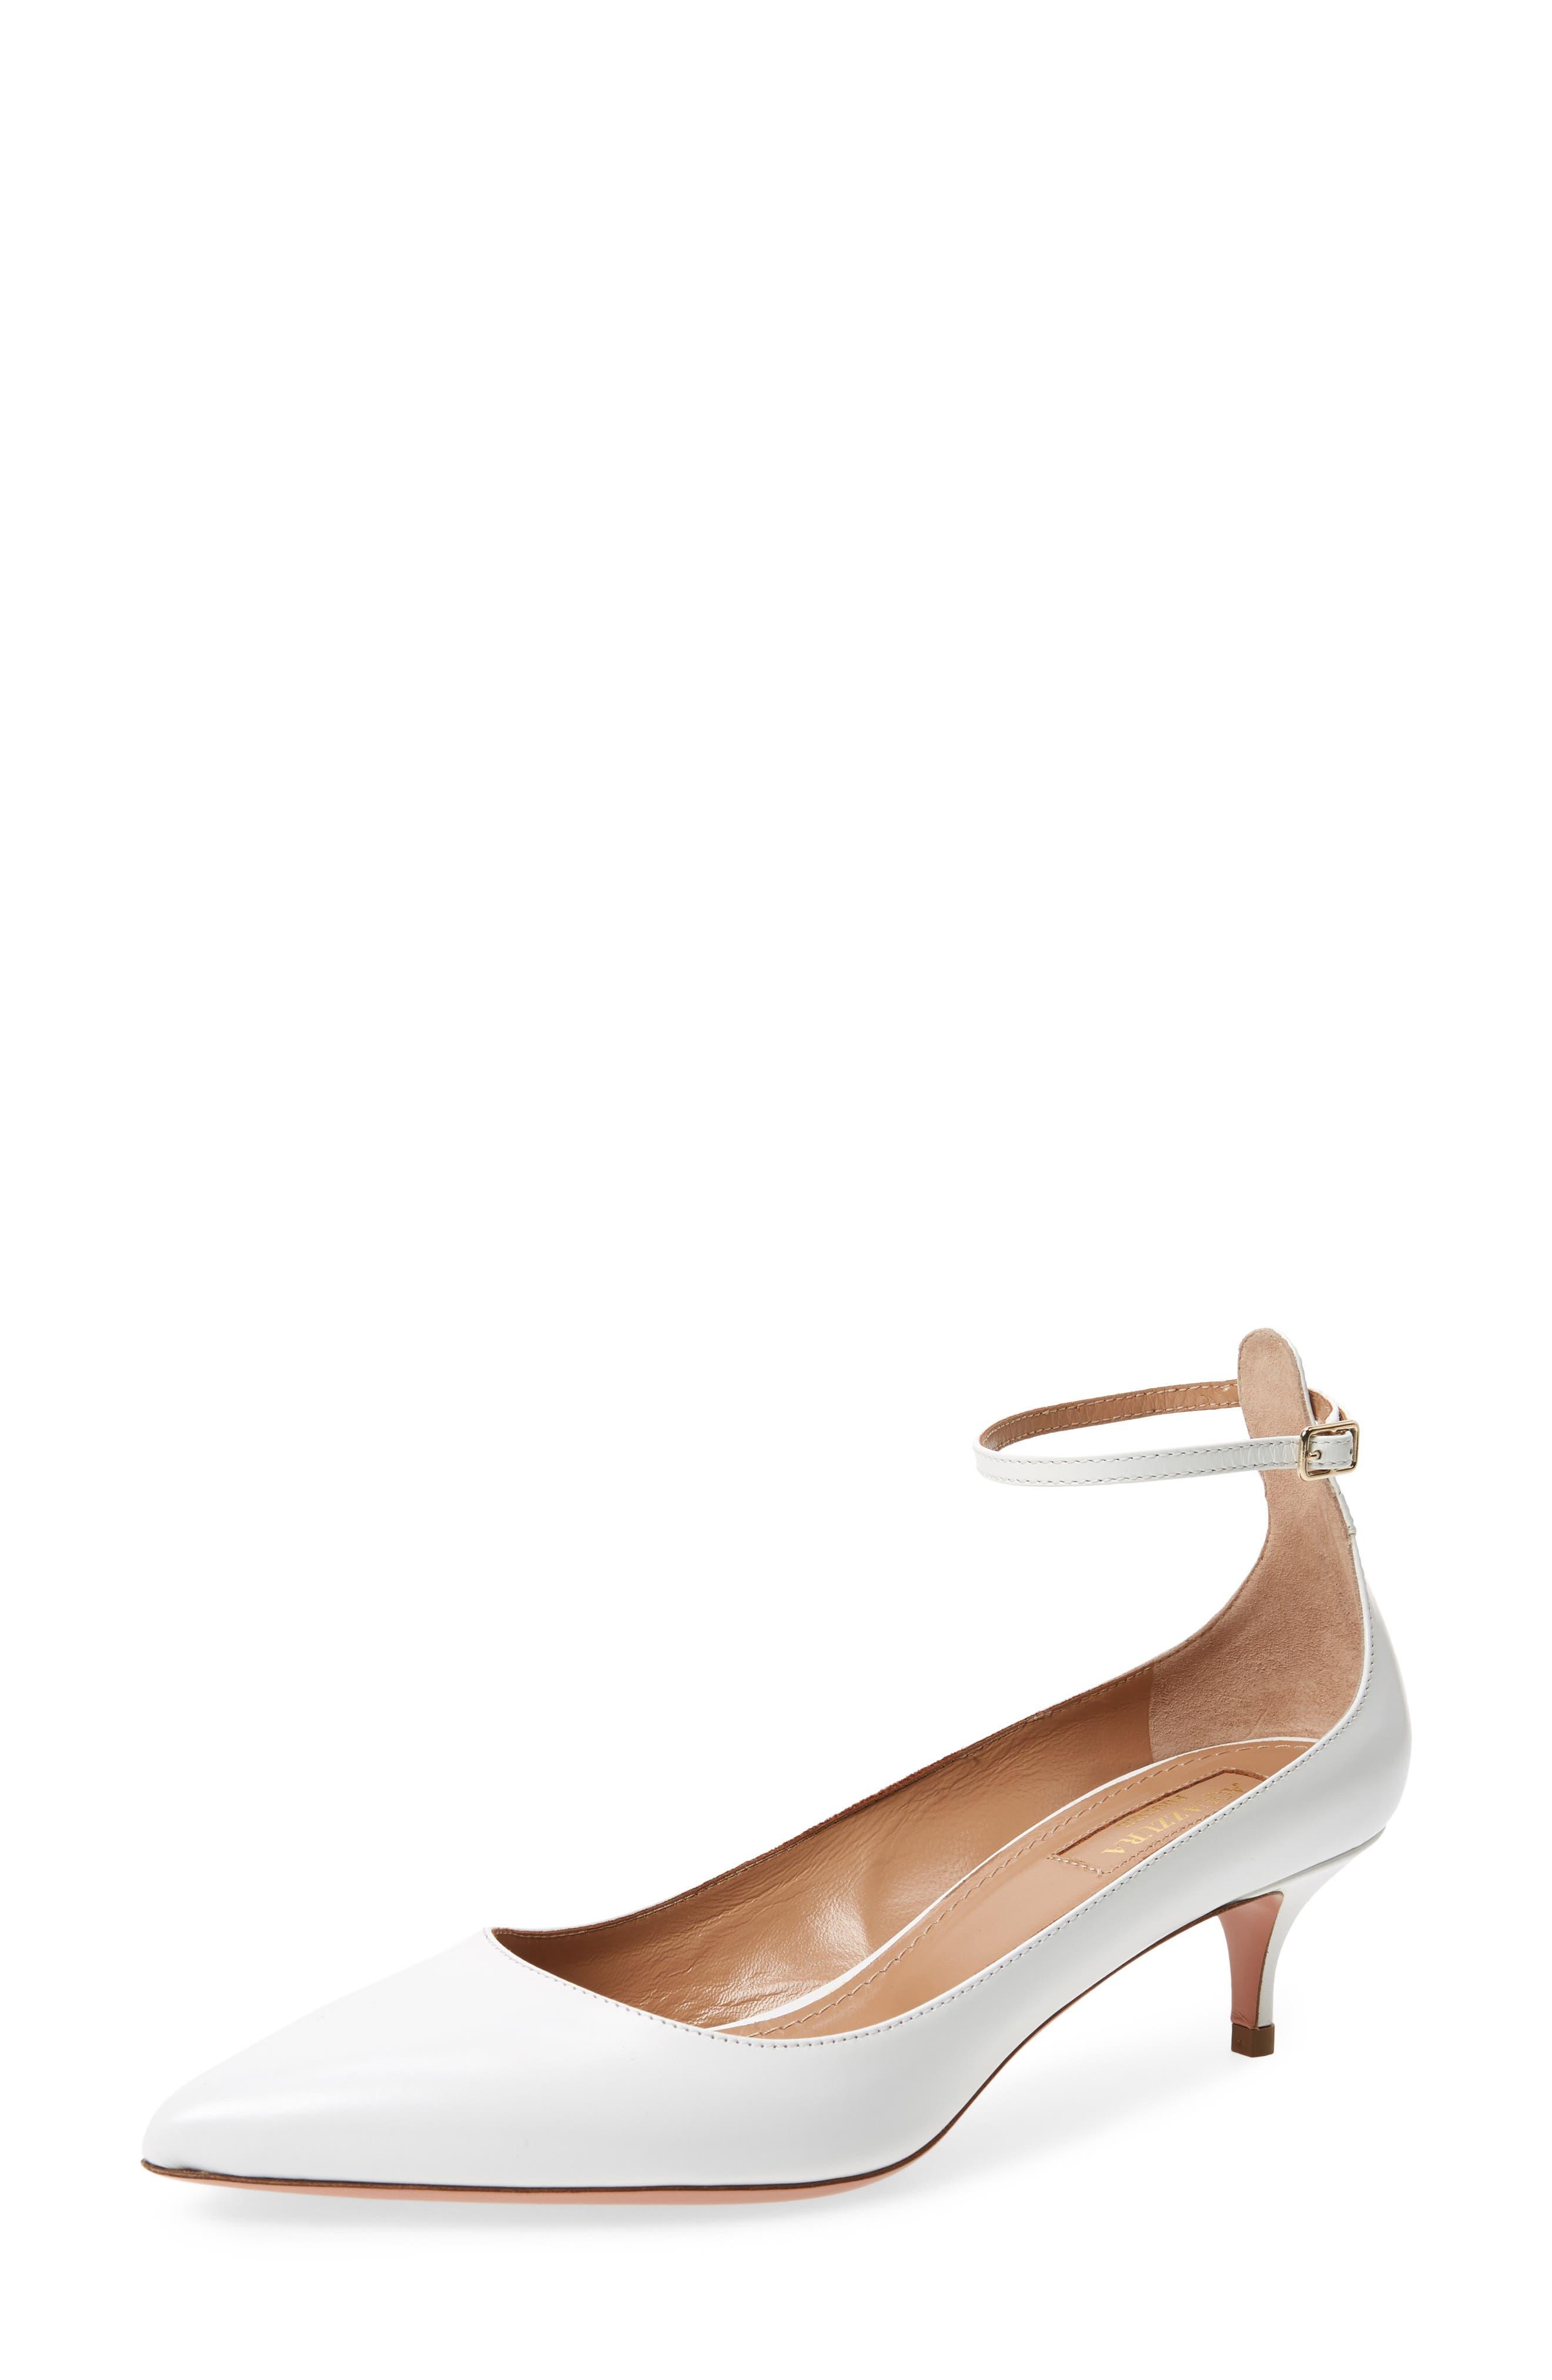 Kisha Ankle Strap Pump,                         Main,                         color,